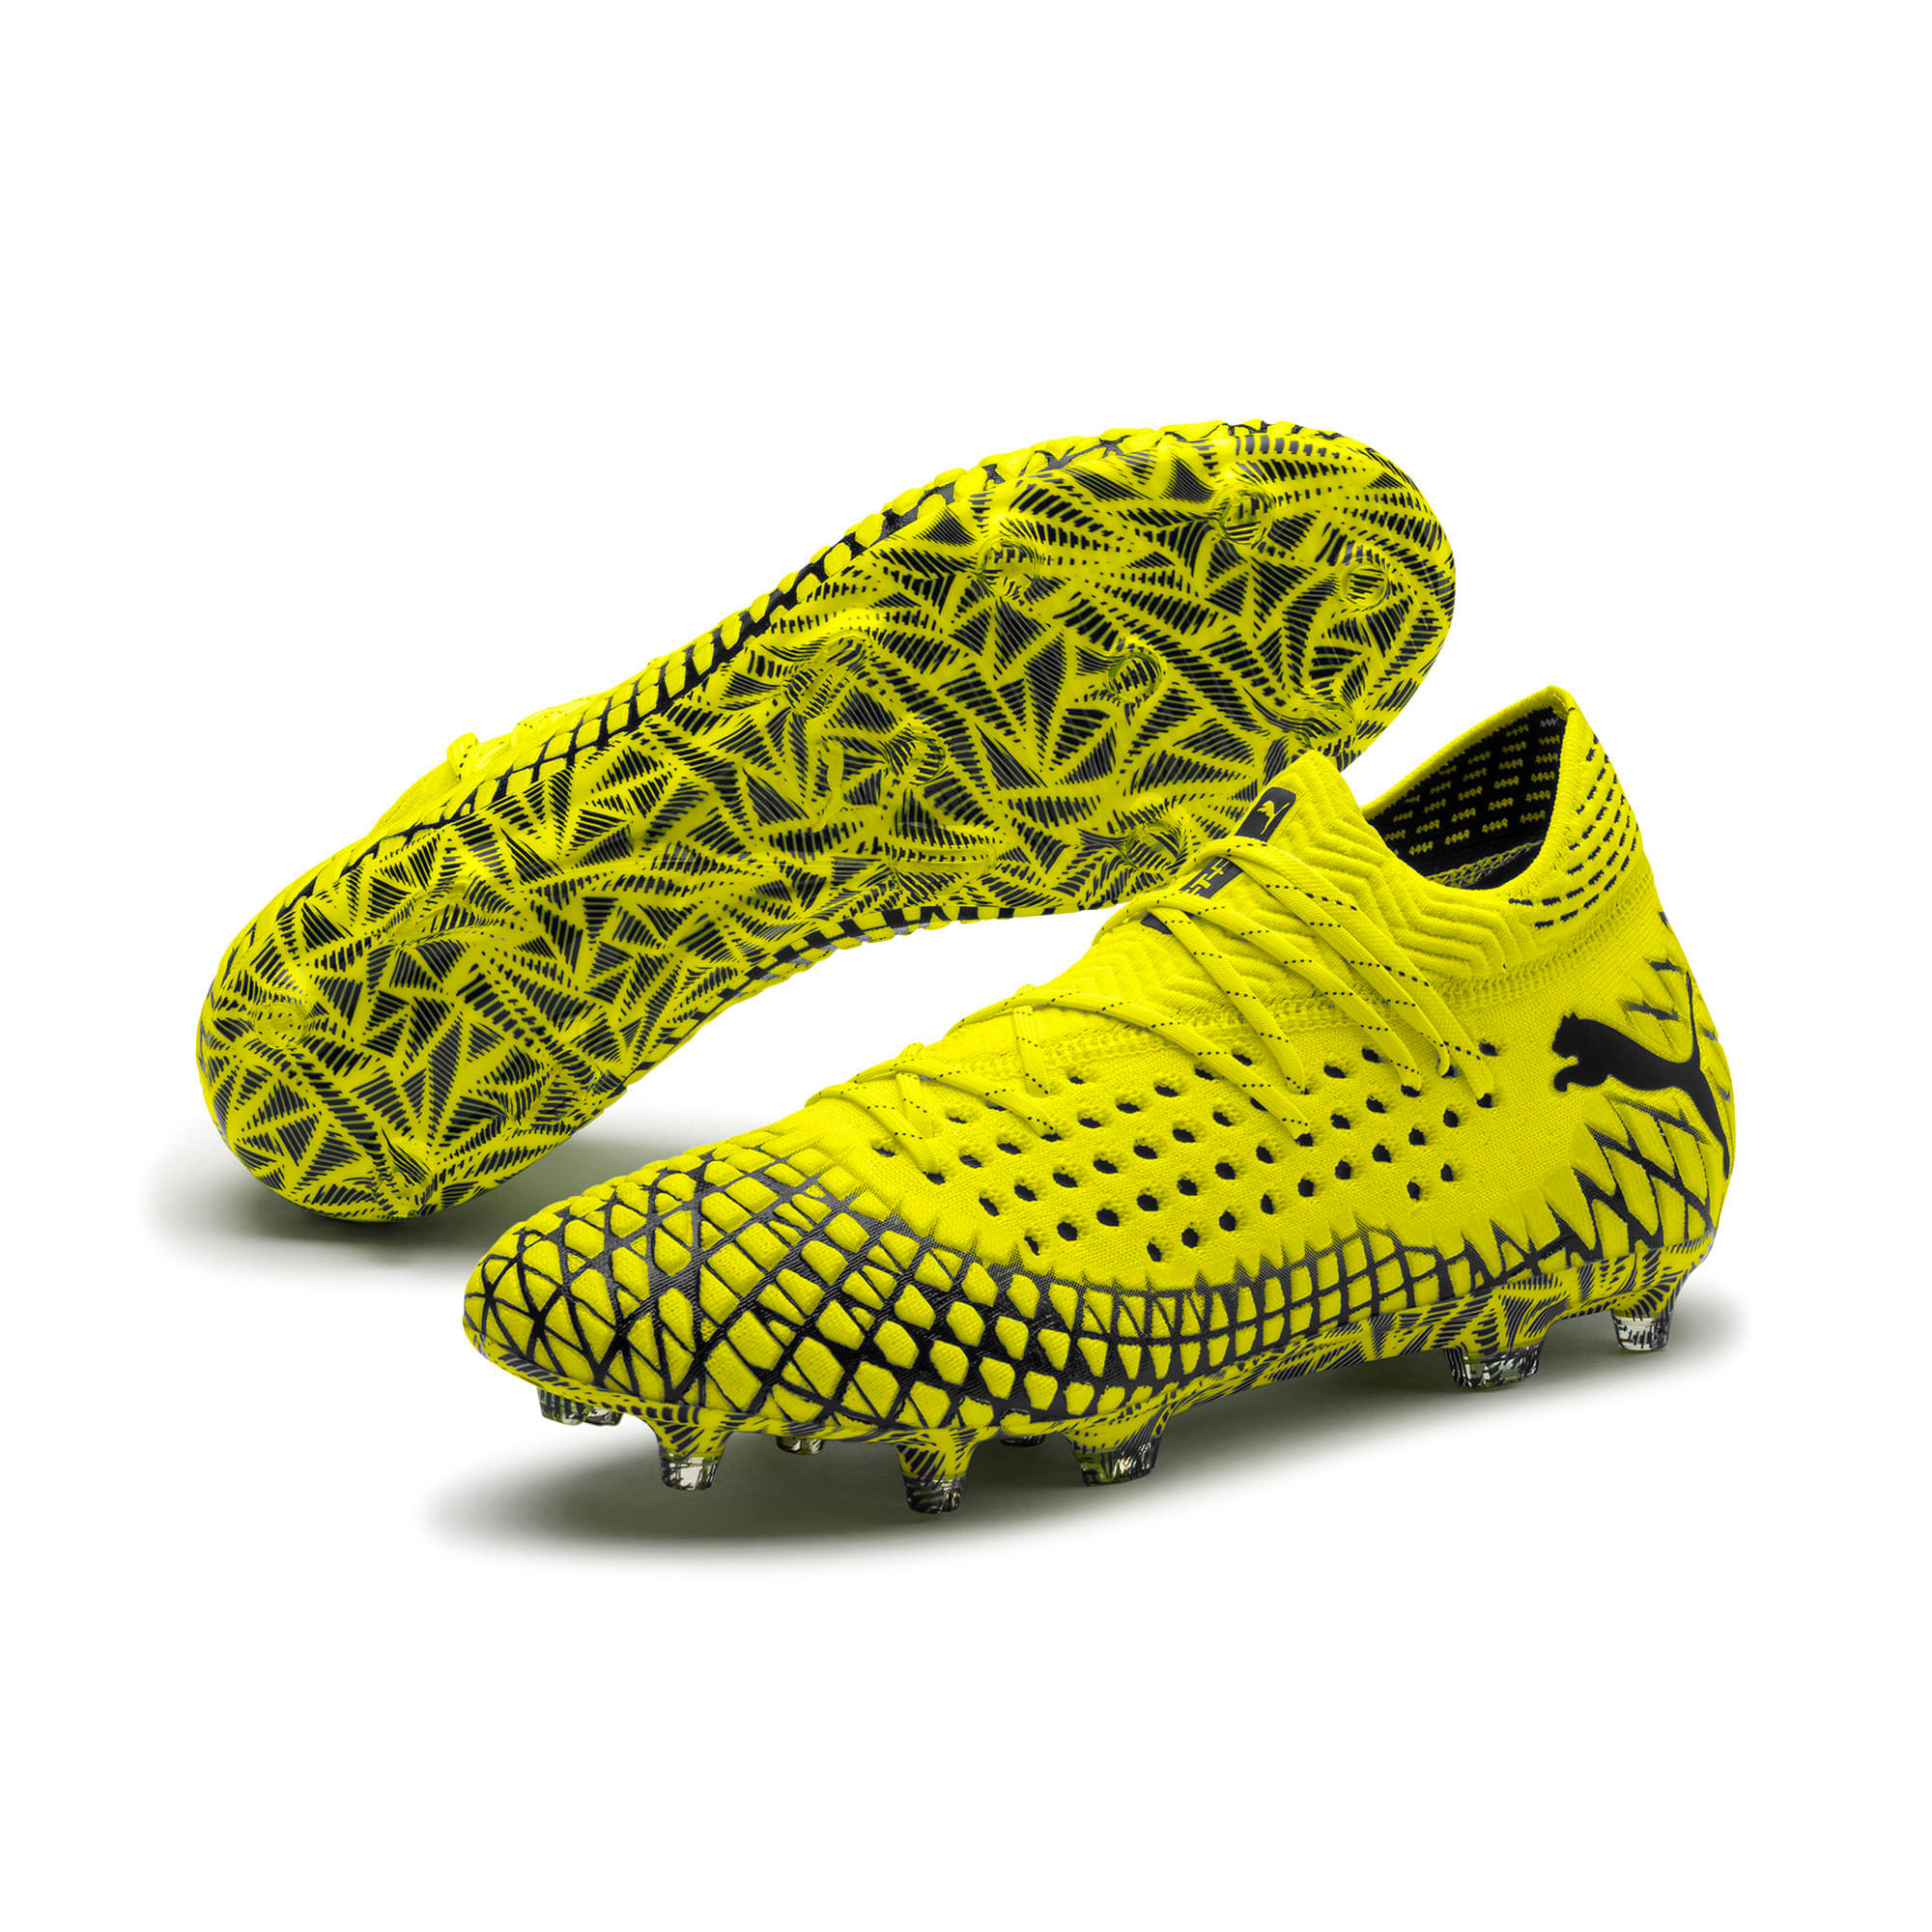 Thumbnail 2 of FUTURE 4.1 NETFIT FG/AG Men's Soccer Cleats, Yellow Alert-Puma Black, medium